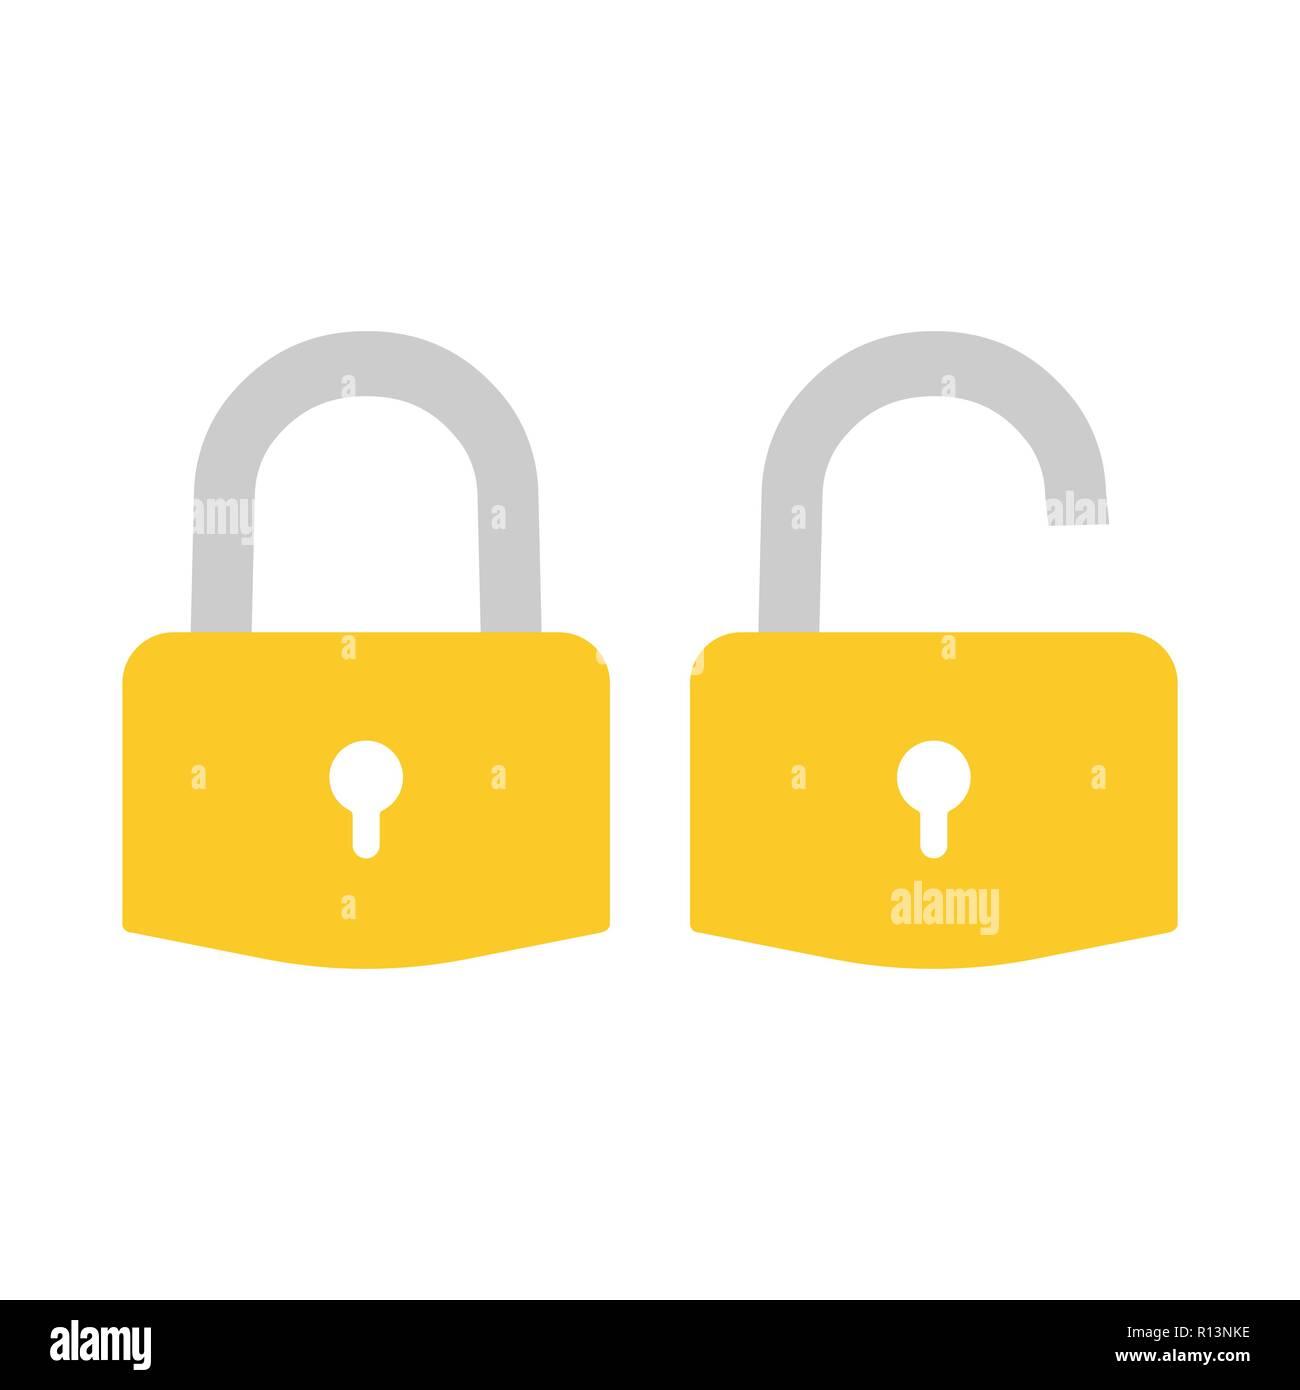 Lock icon. Padlock sign. Unlock. Vector illustration. Flat design. - Stock Vector